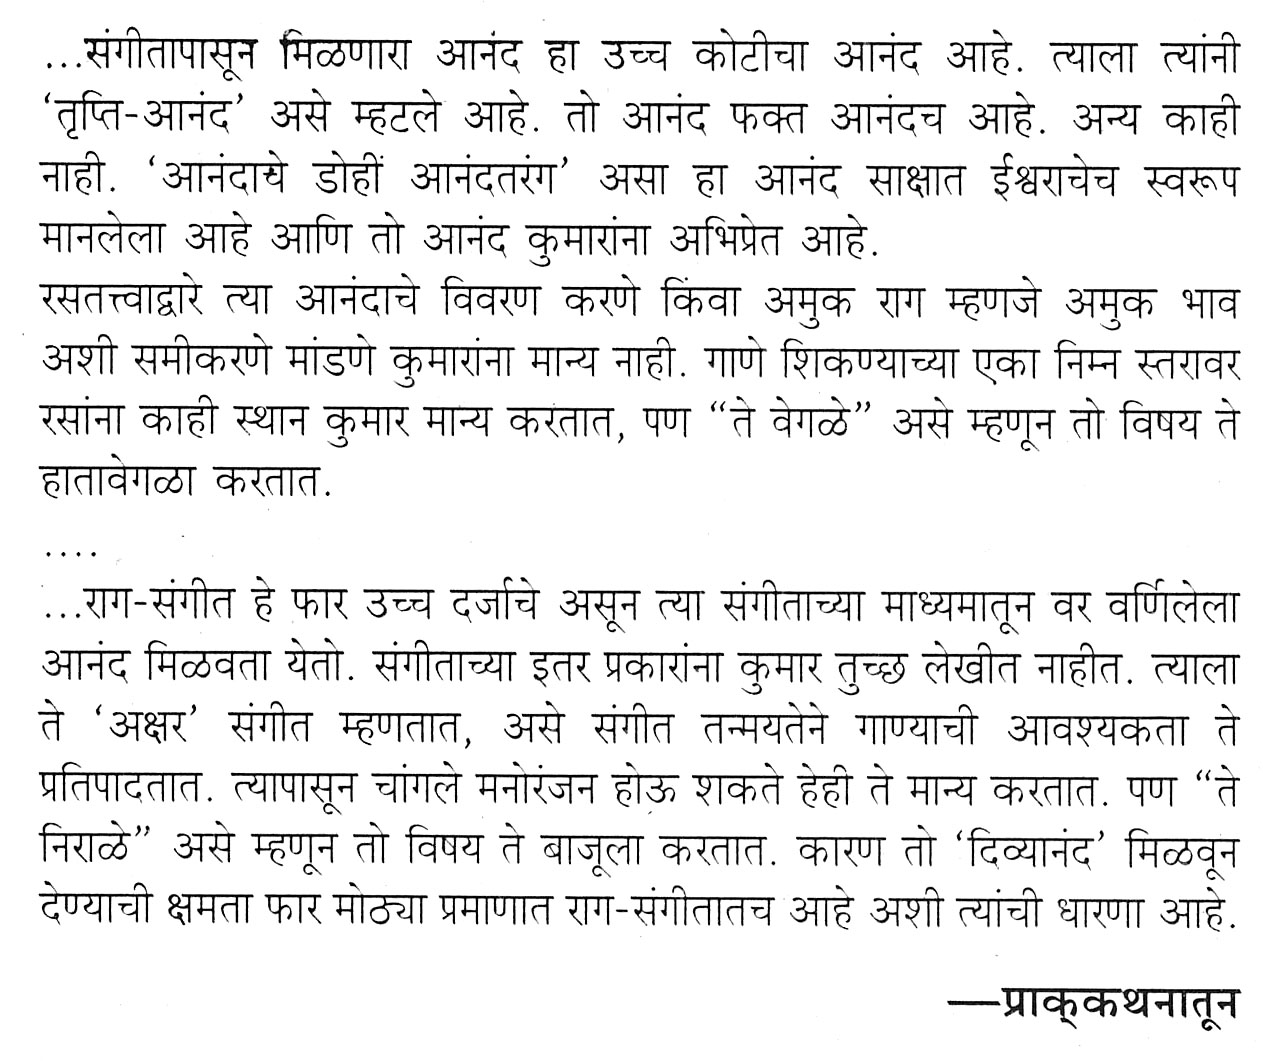 Kumargandharv blurb